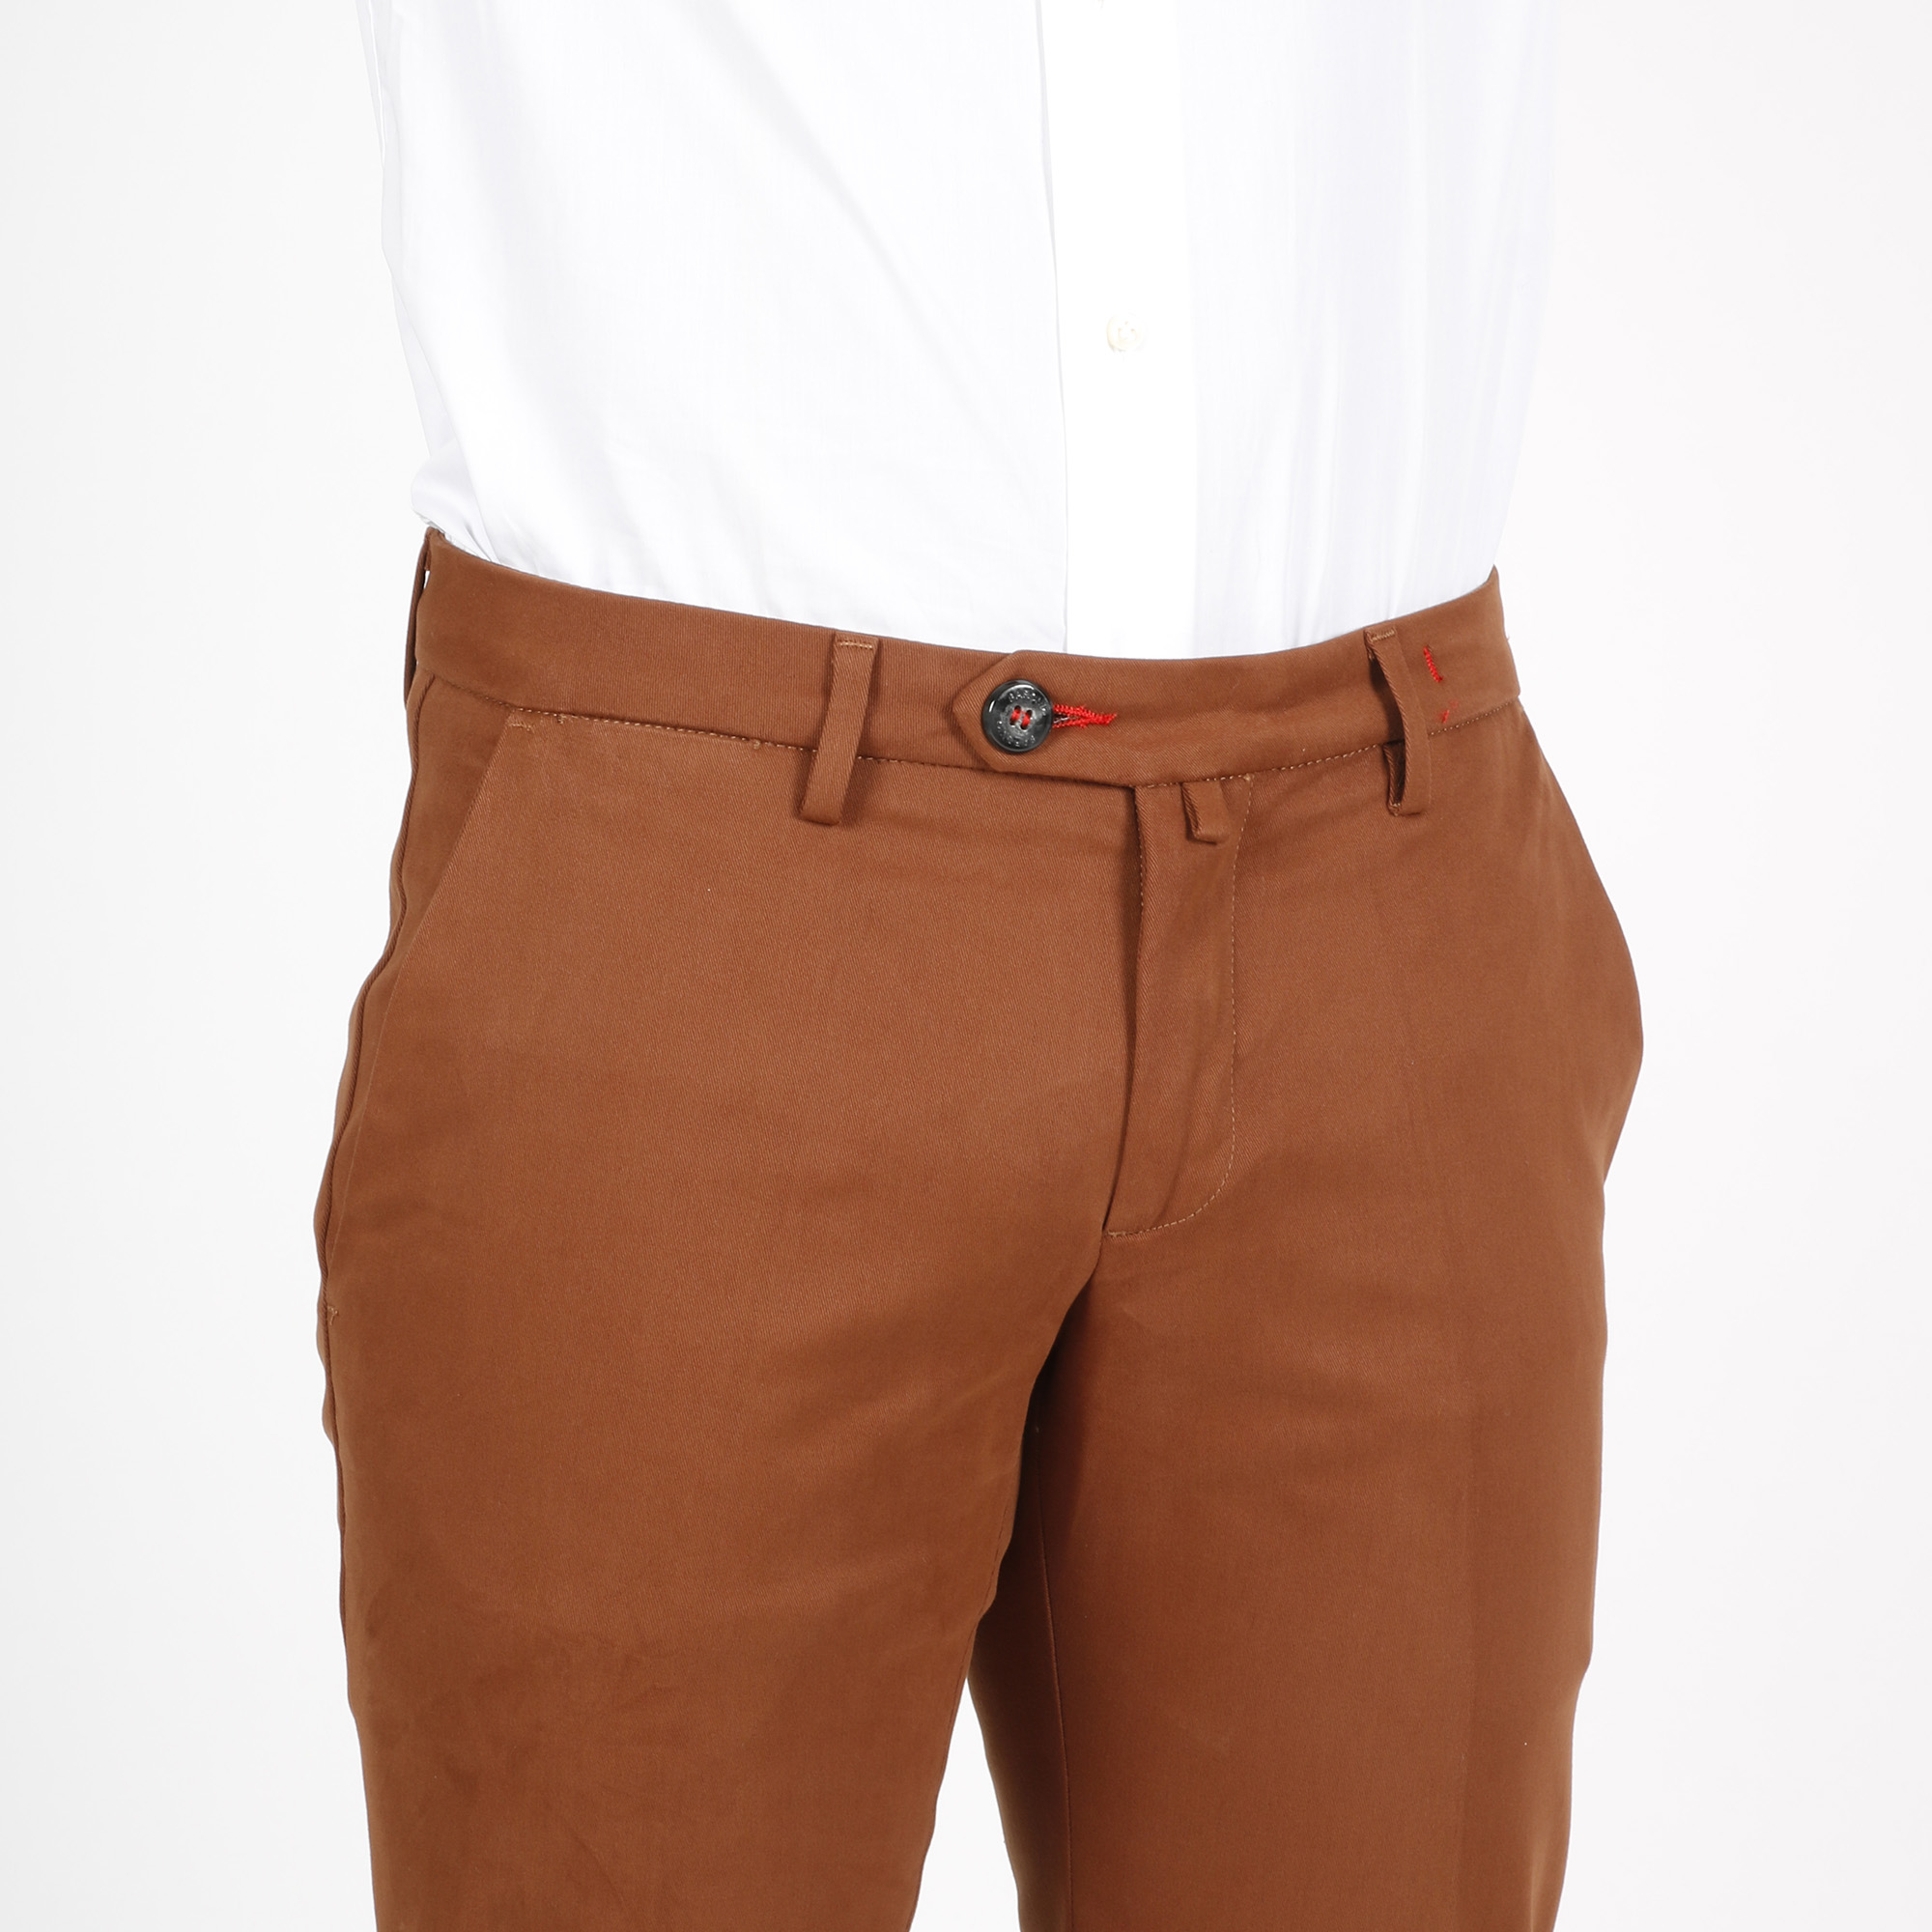 Pantalone reef - Biscotto